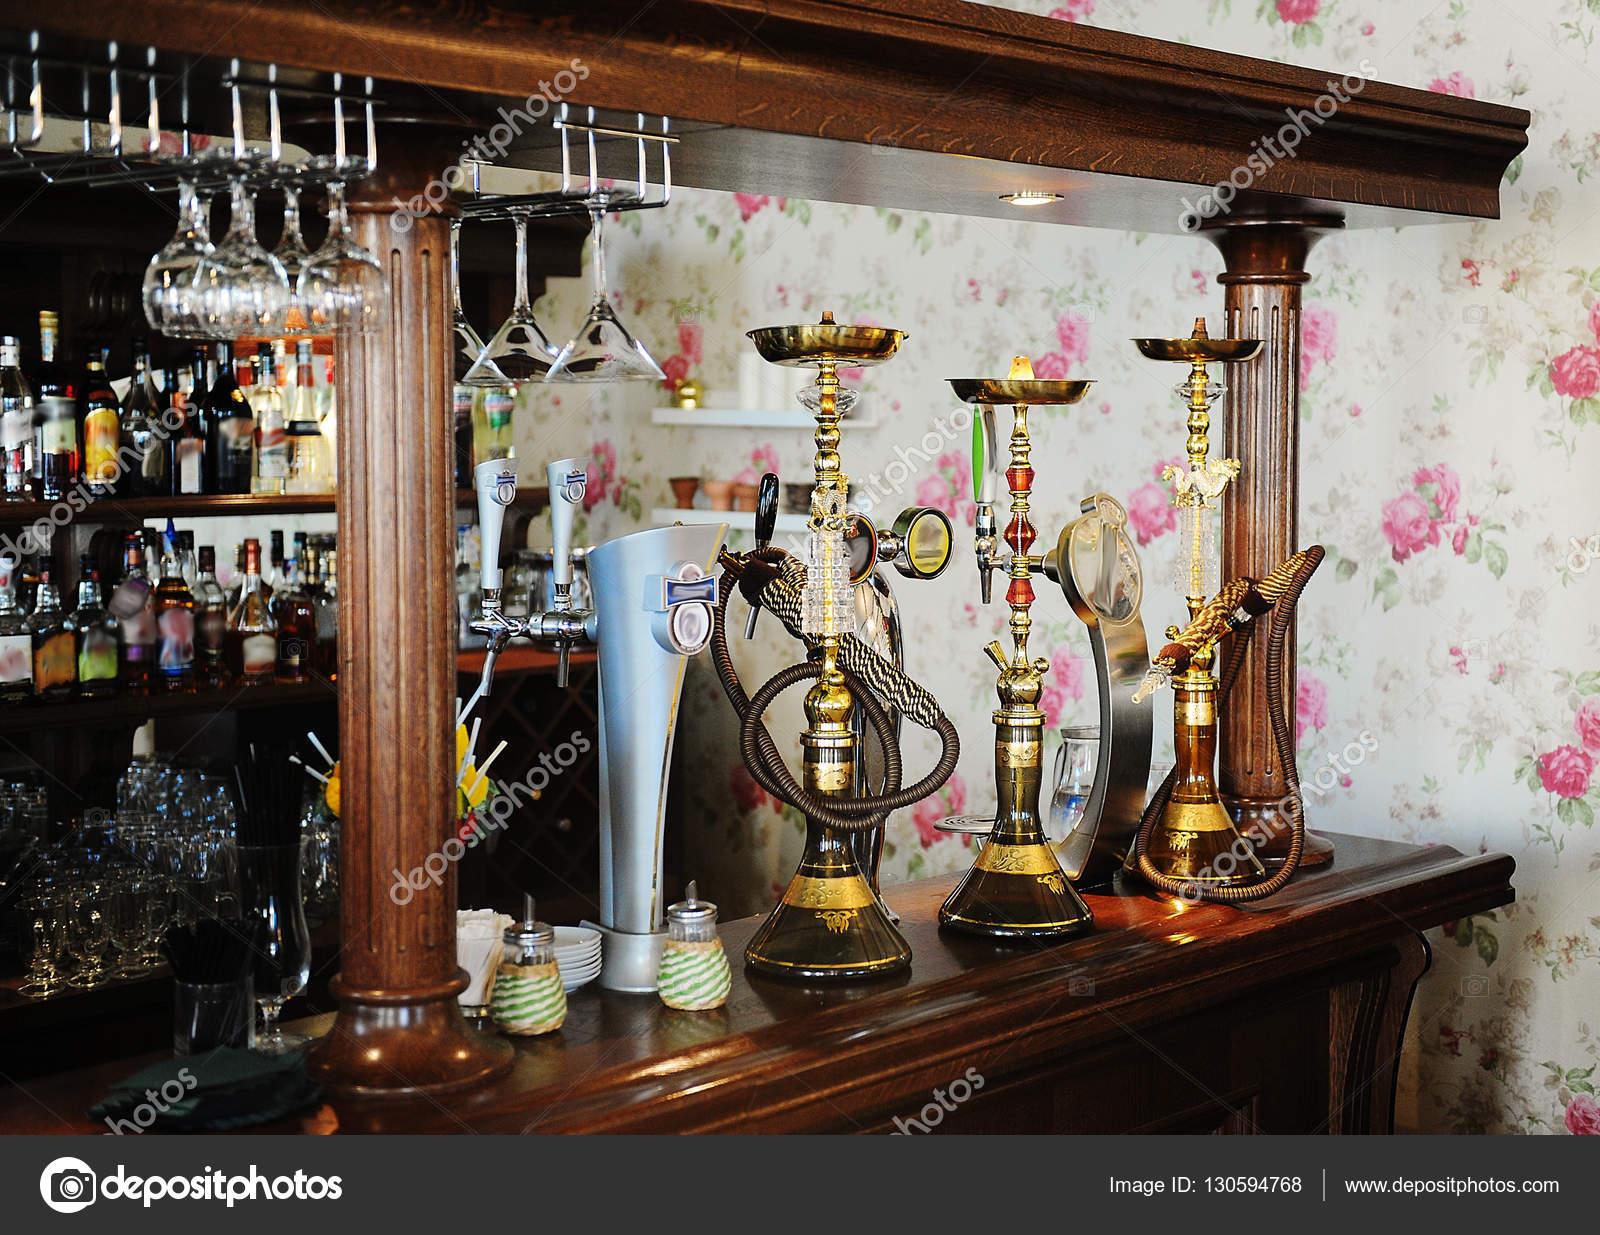 Die Bar im Restaurant. Bier vom Fass, Shisha, Alkohol-Vitrinen ...